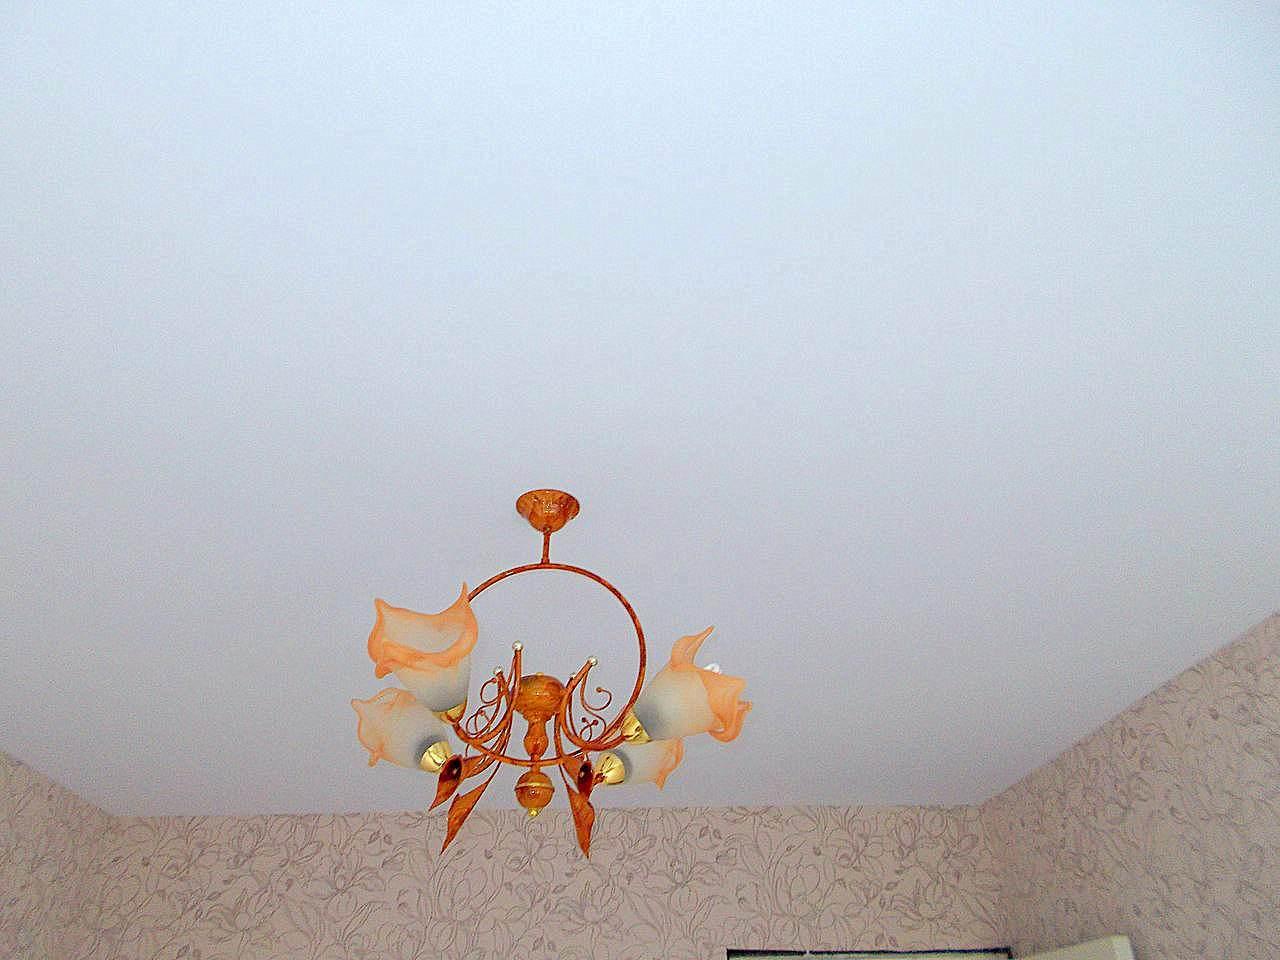 Faux plafond translucide merignac simulation prix for Tarif faux plafond